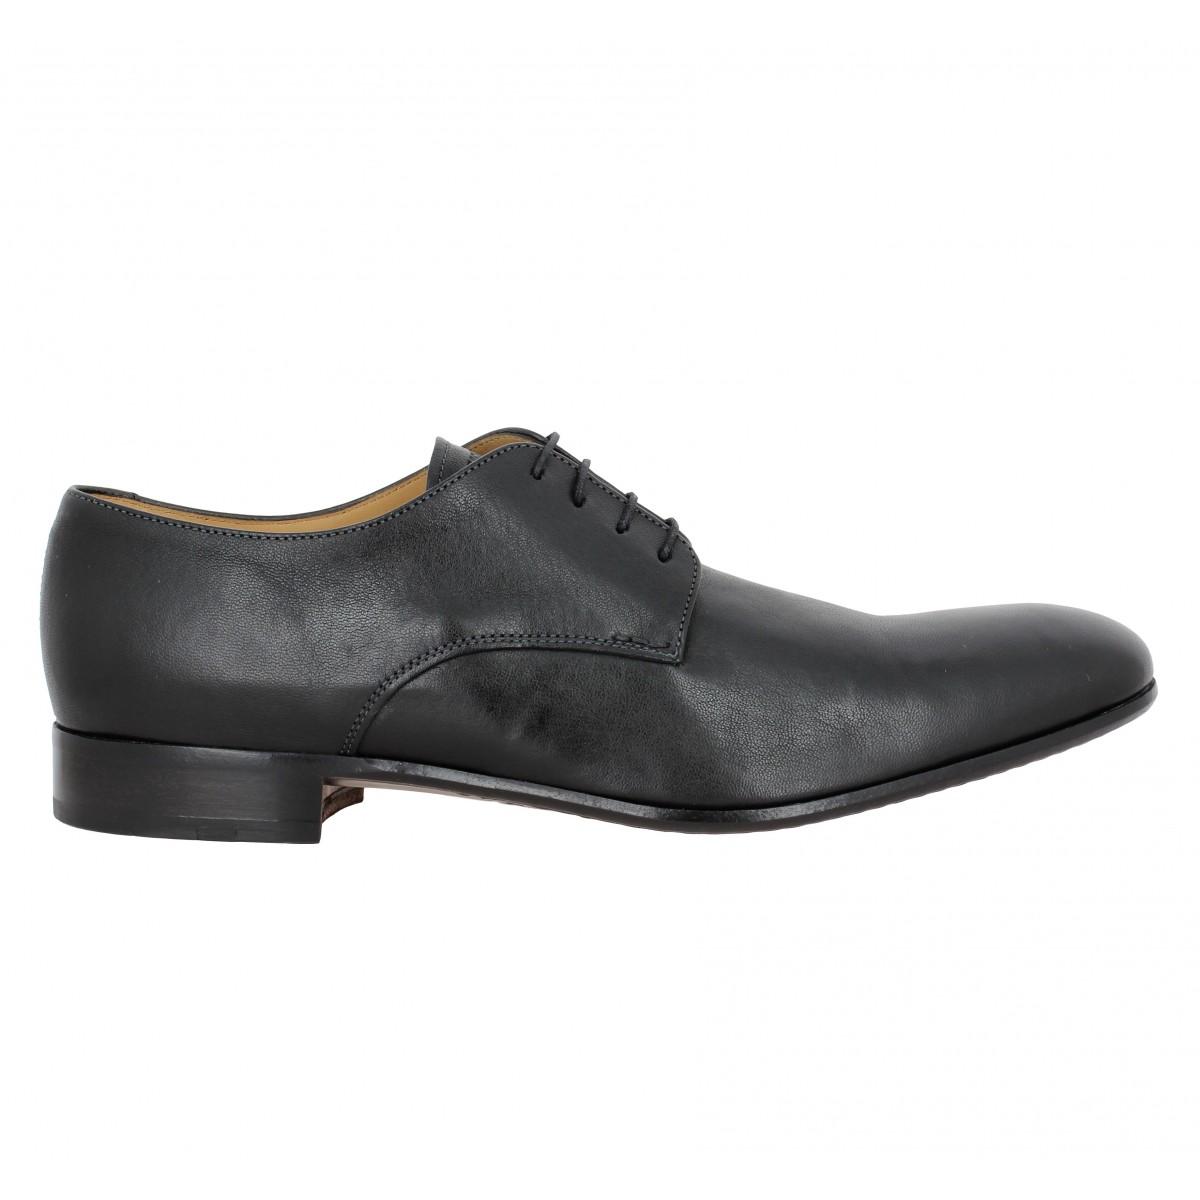 heschung nerium safari cuir homme noir fanny chaussures. Black Bedroom Furniture Sets. Home Design Ideas